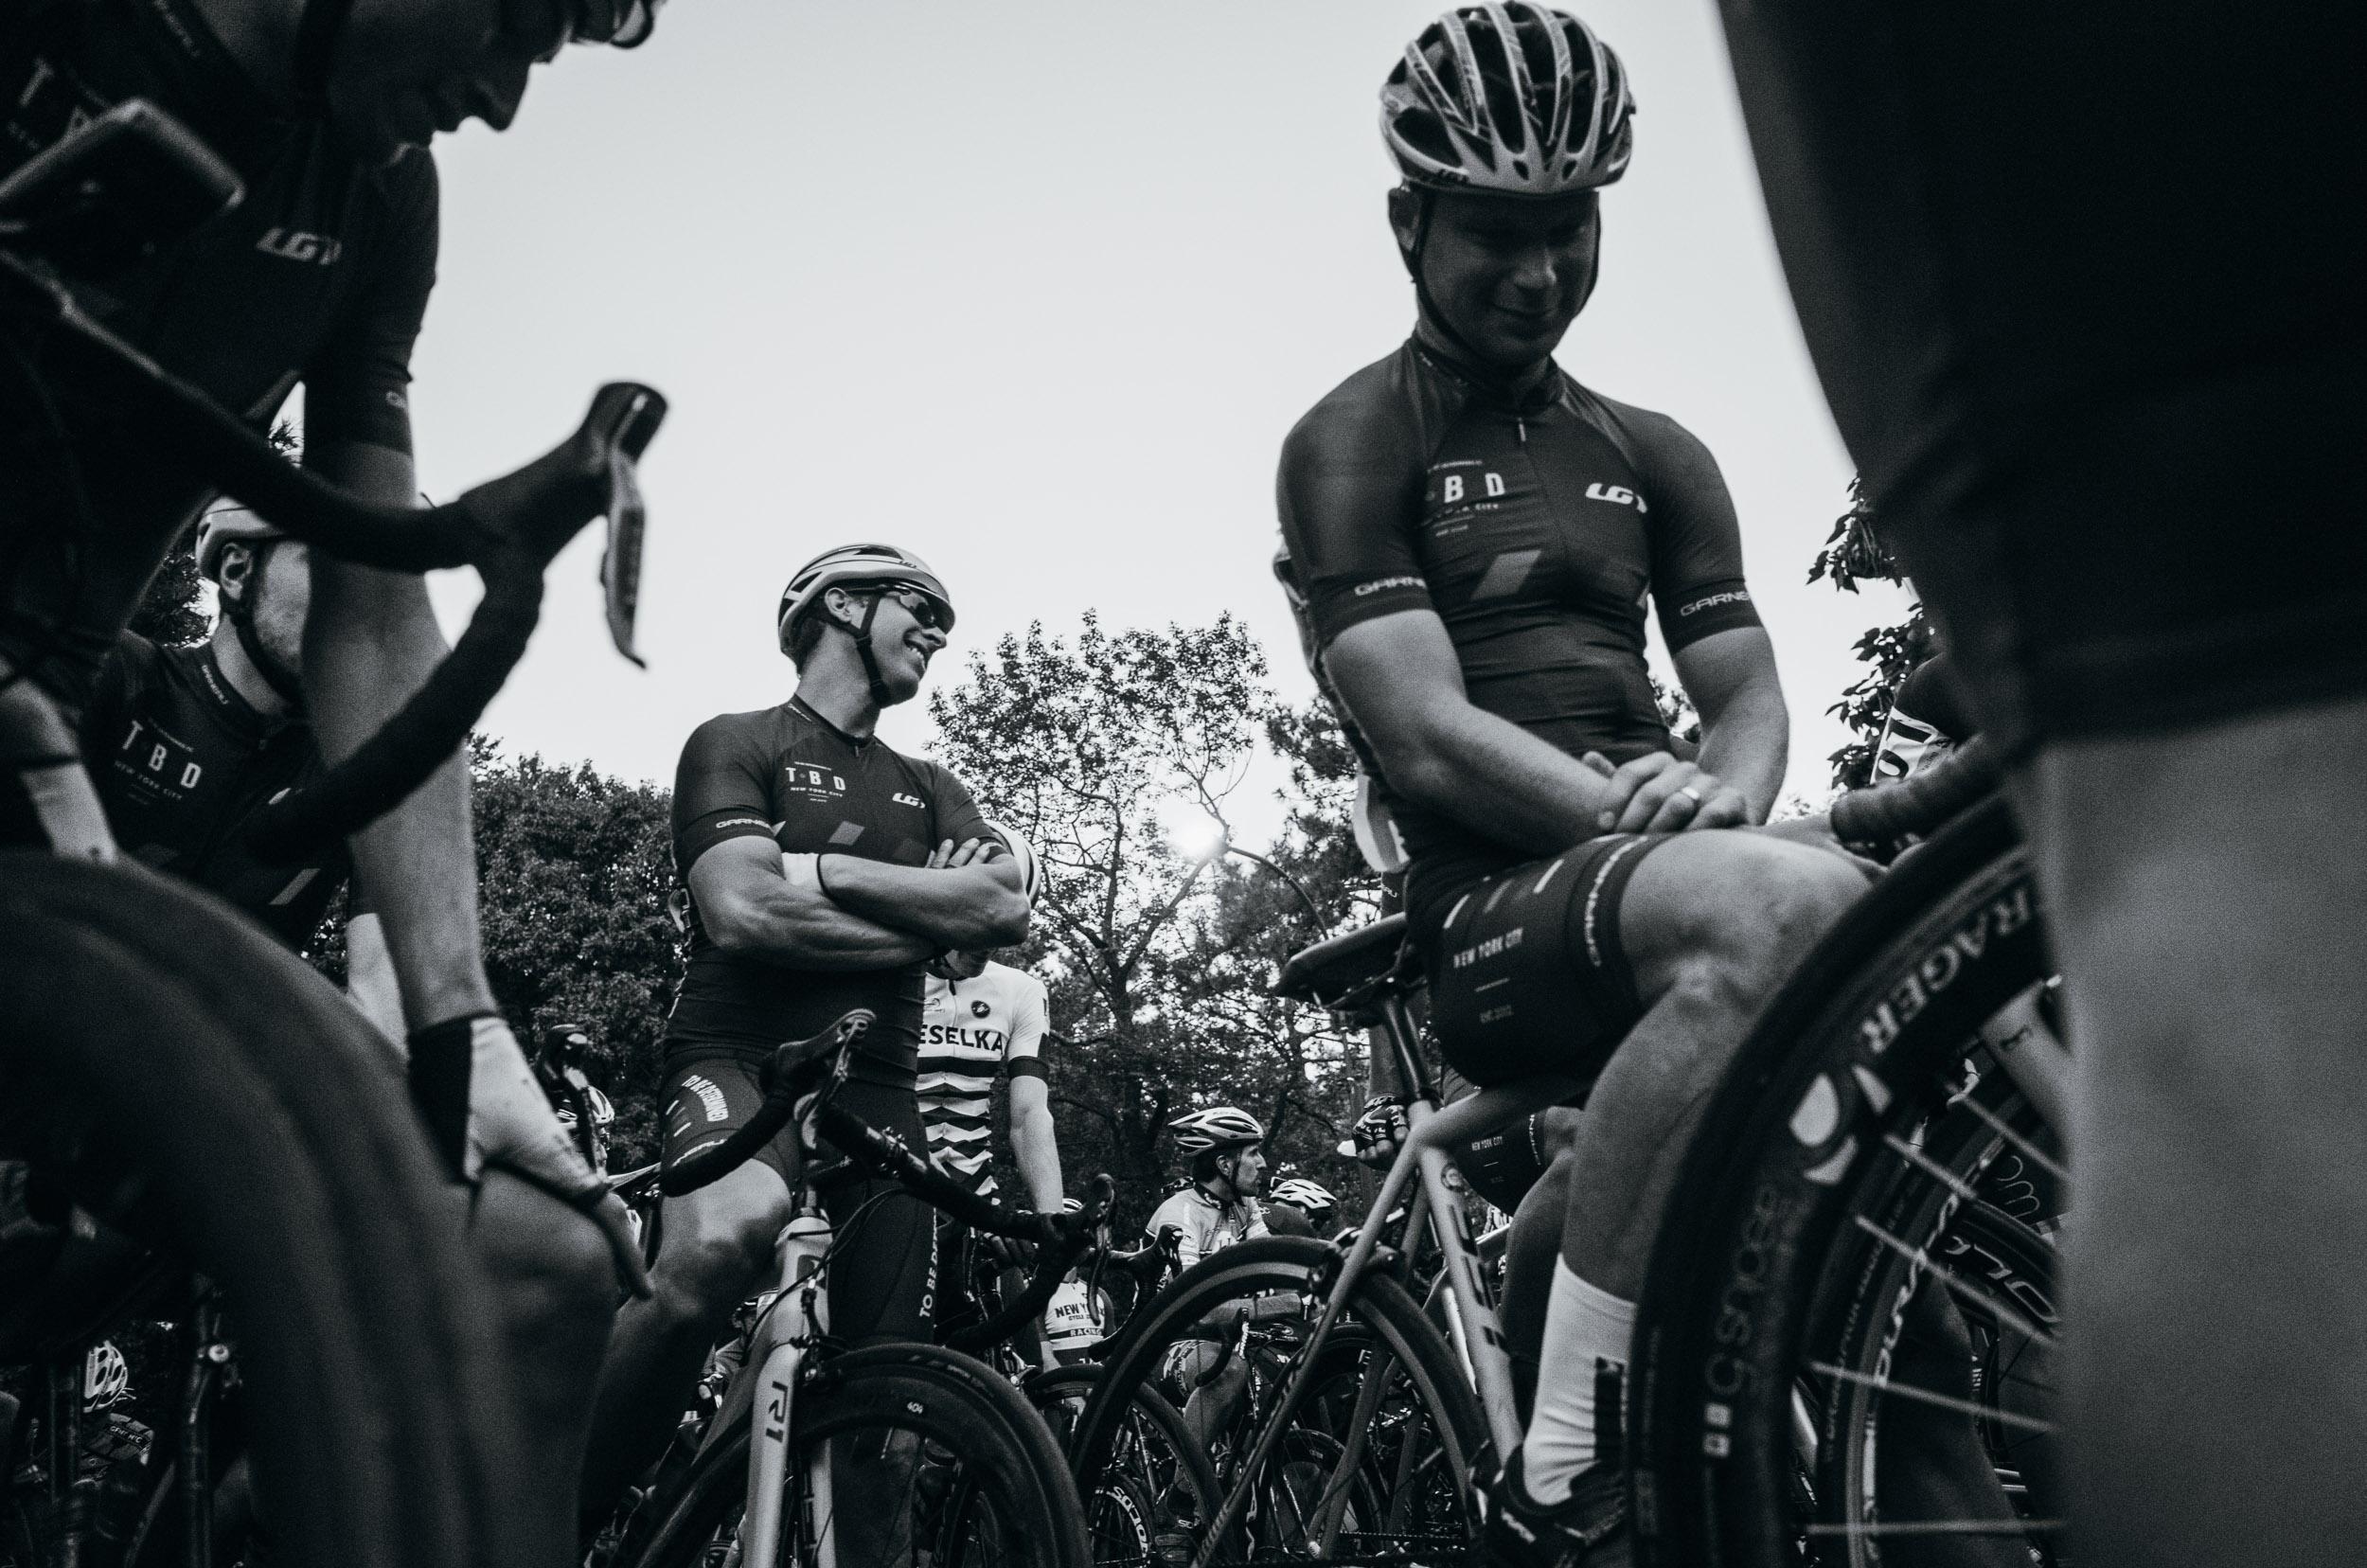 photo-rhetoric-to-be-determined-crca-club-race-117.jpg